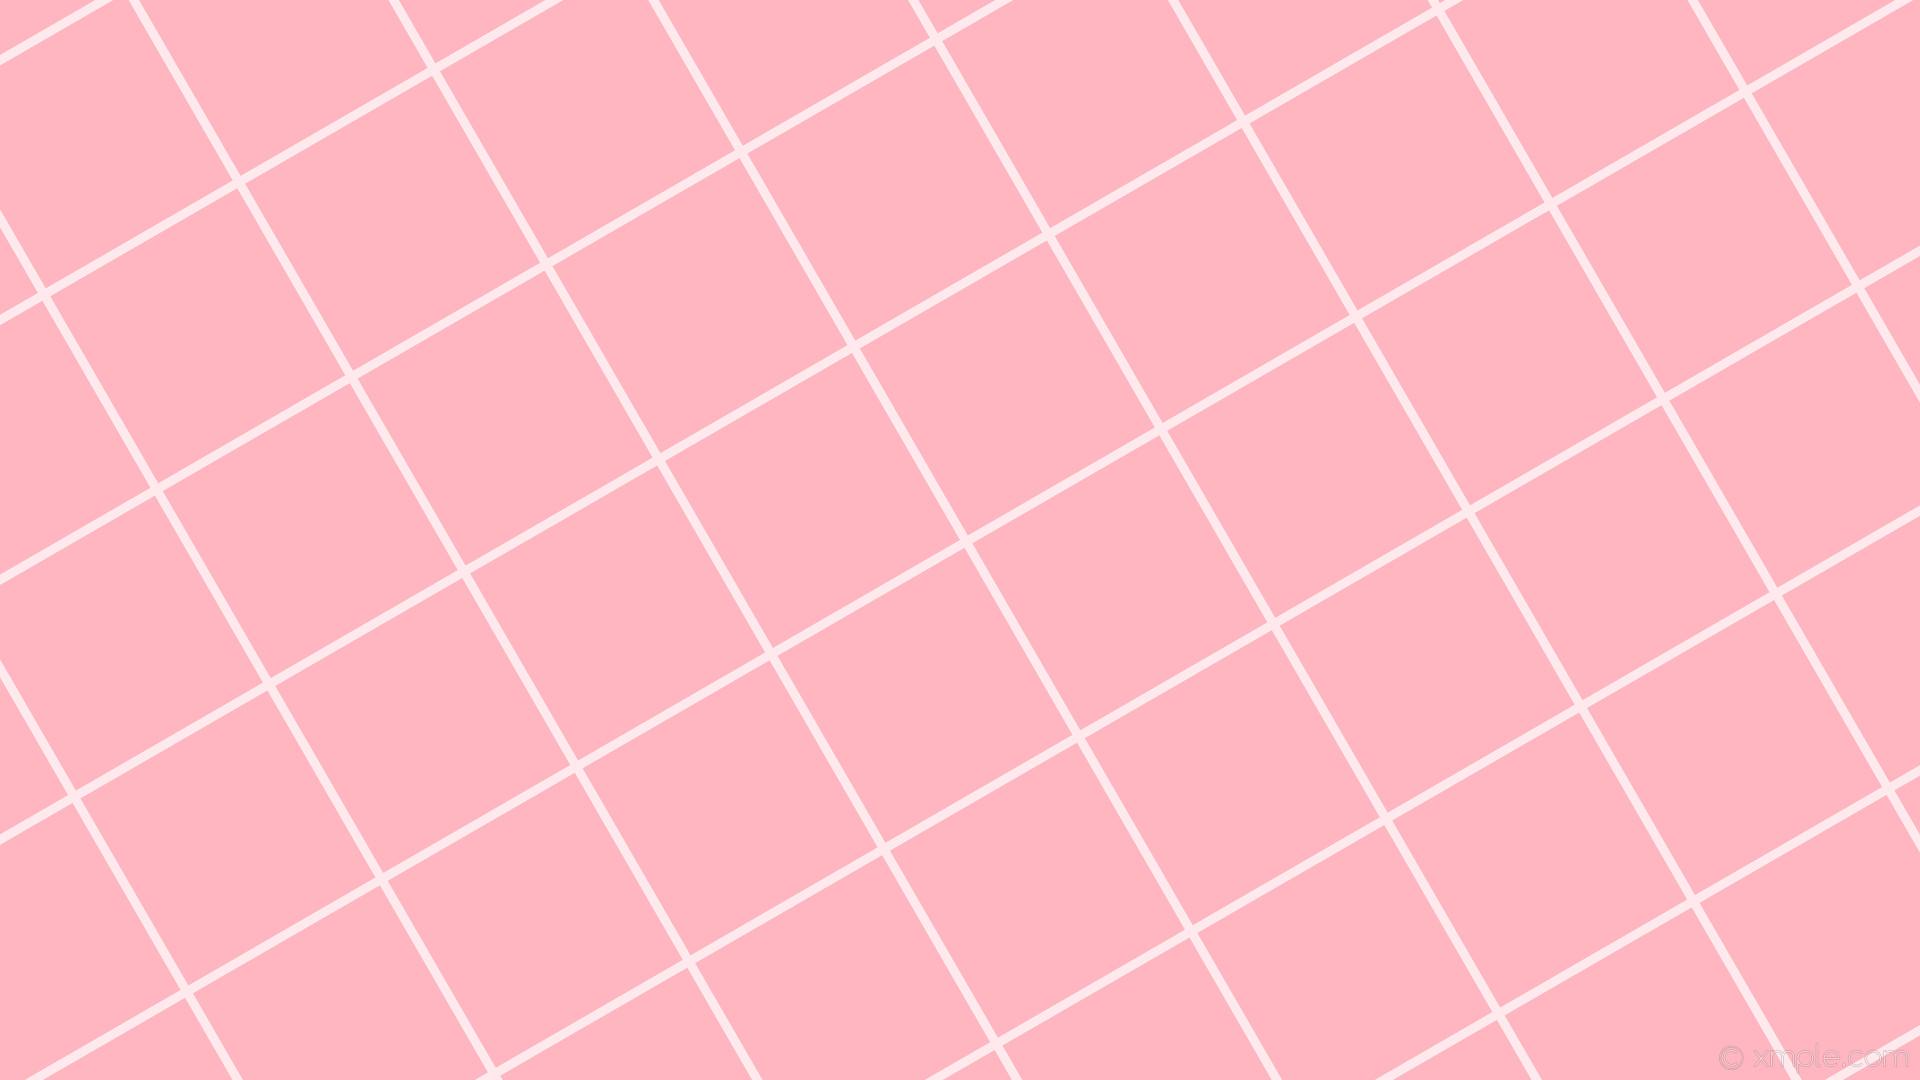 Res: 1920x1080, wallpaper white pink graph paper grid light pink #ffb6c1 #ffffff 30° 9px  225px